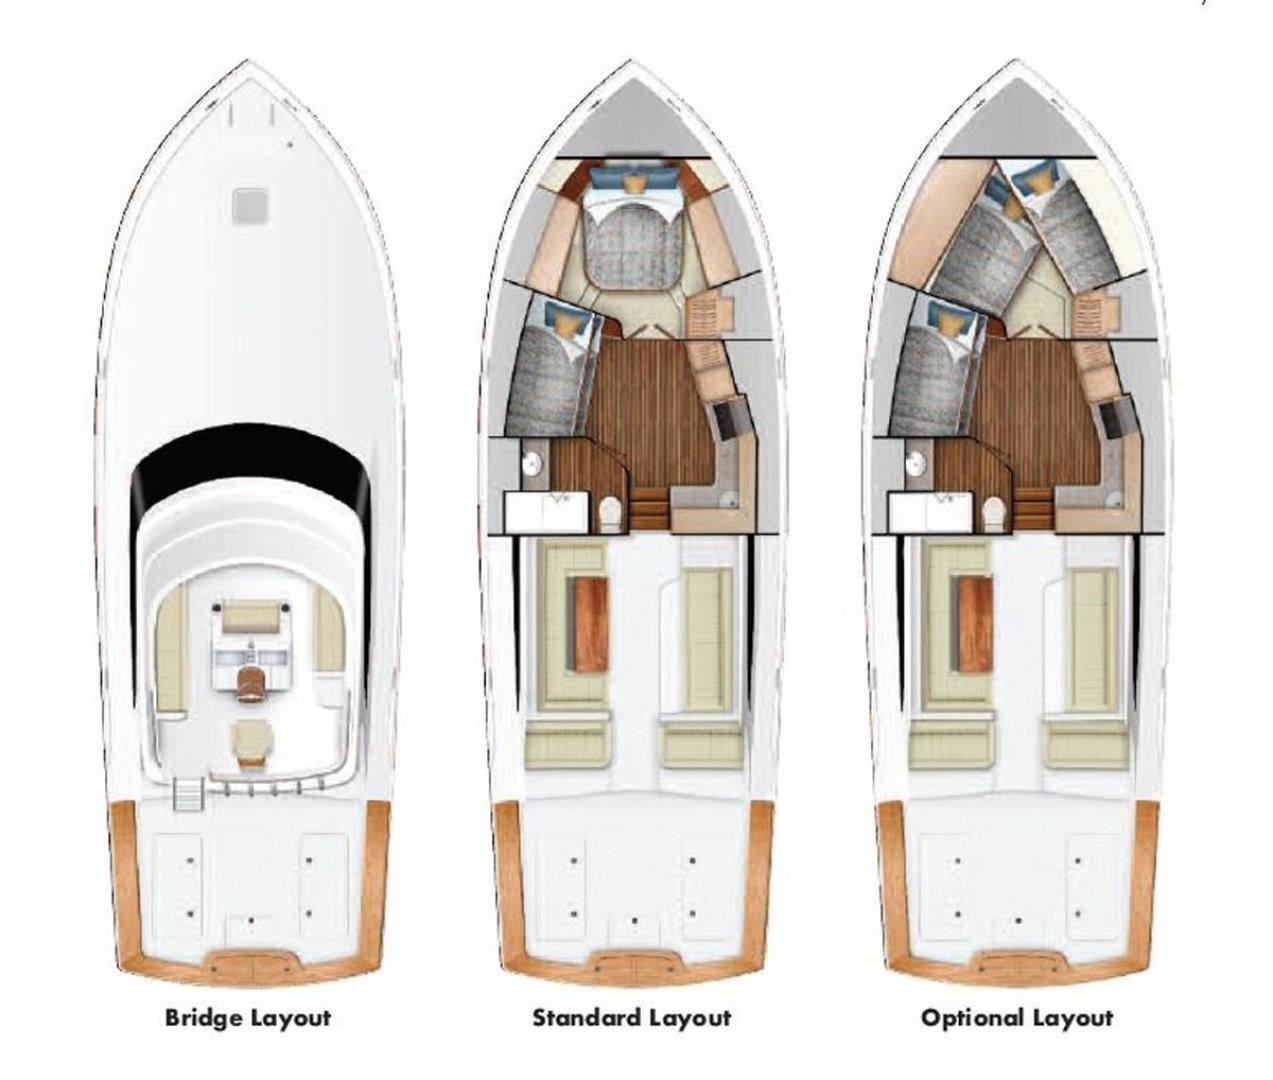 Exterior/Interior Layout Options